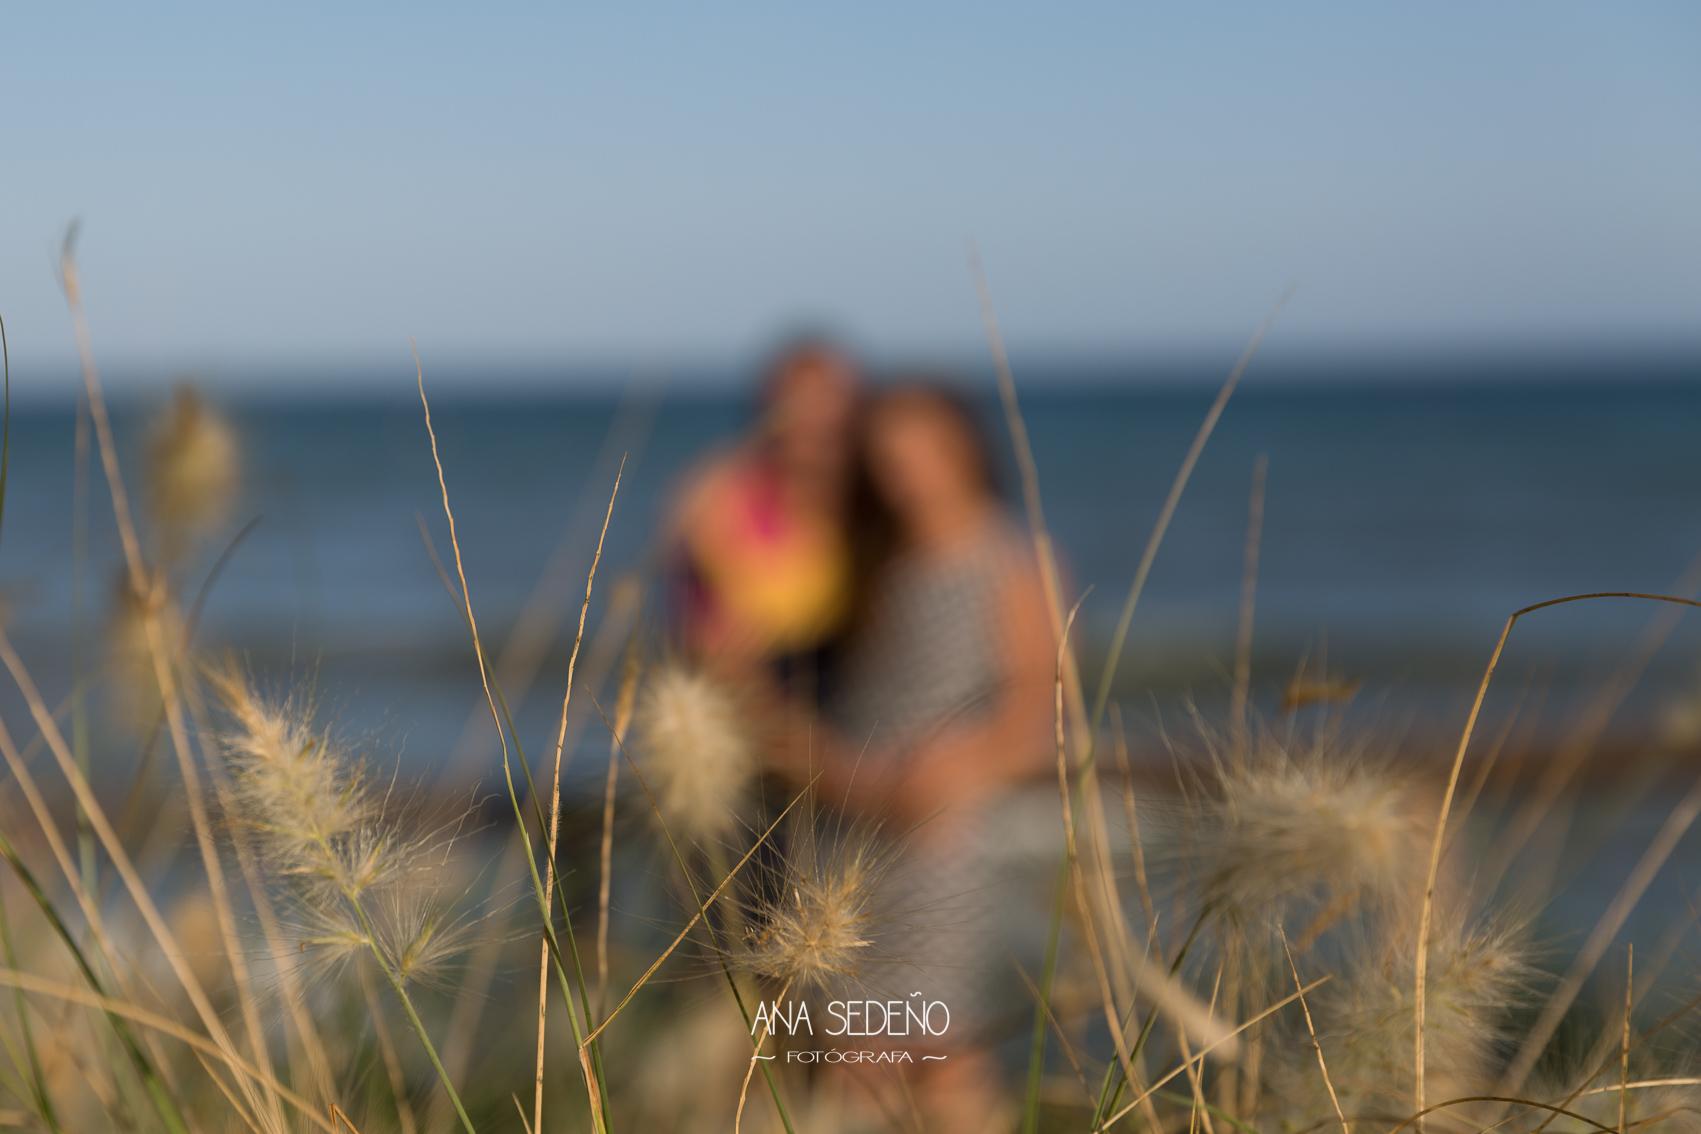 Ana Sedeño Fotografa.-PreBJ & L-0012